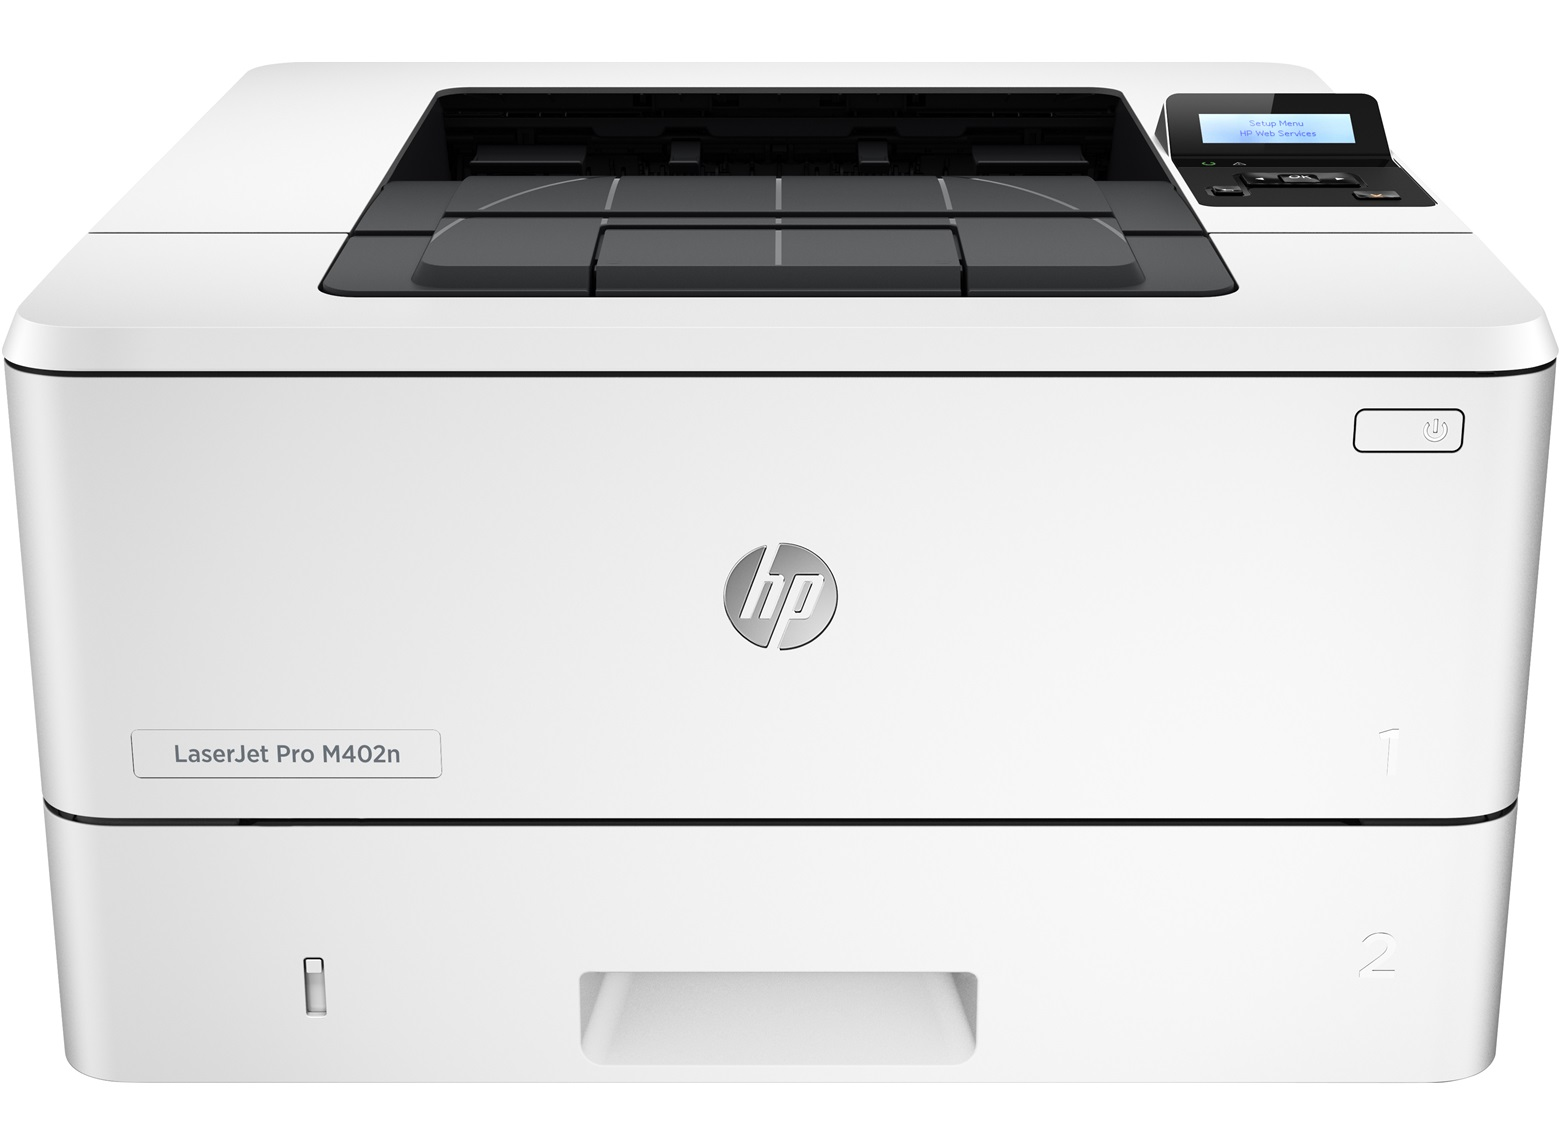 HP LaserJet Pro 400 M402n (38str/min, A4, USB, Ethernet)